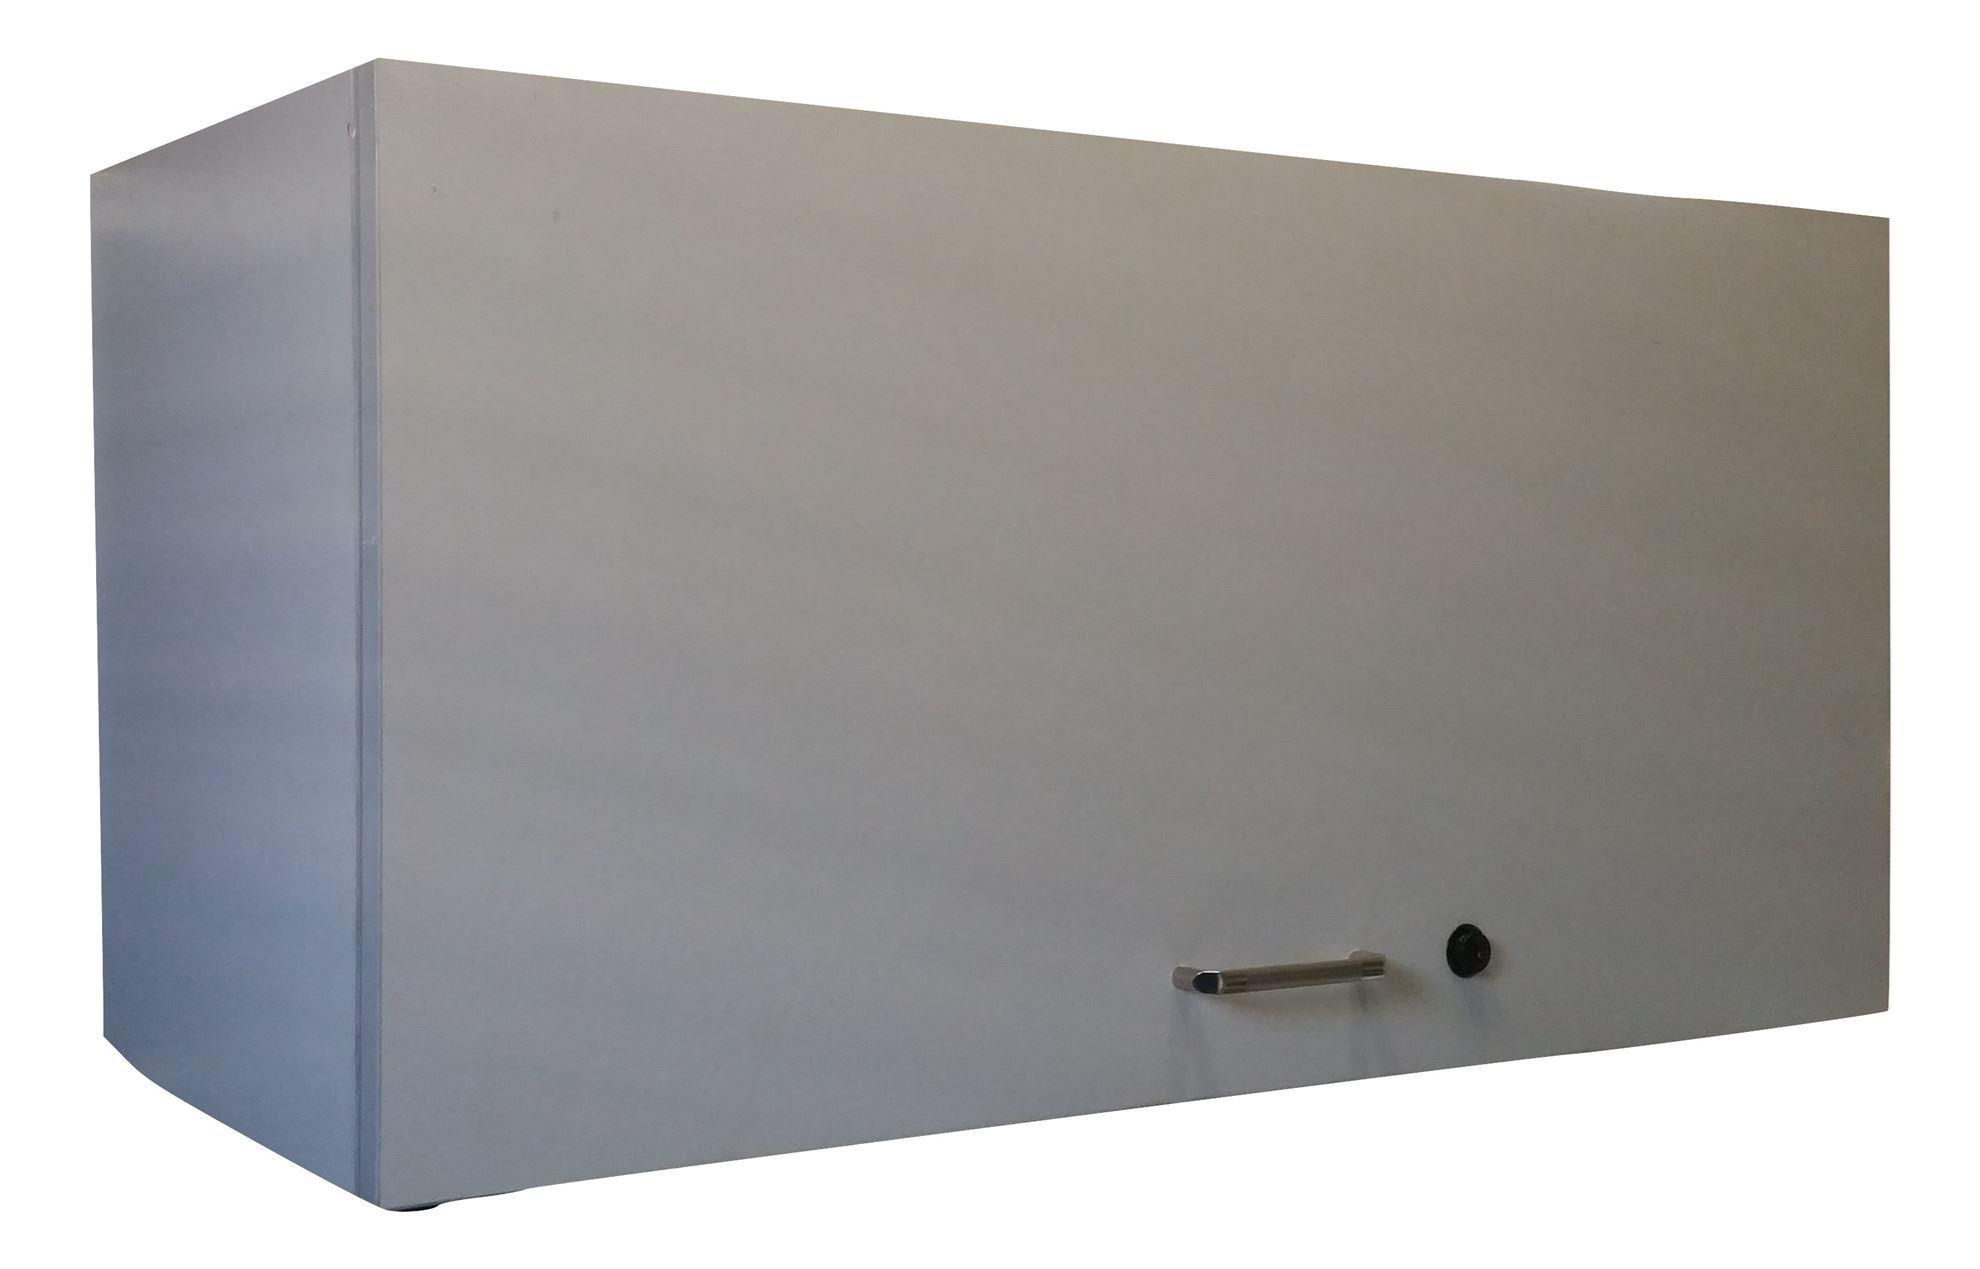 Image 800 Hanging Cabinet